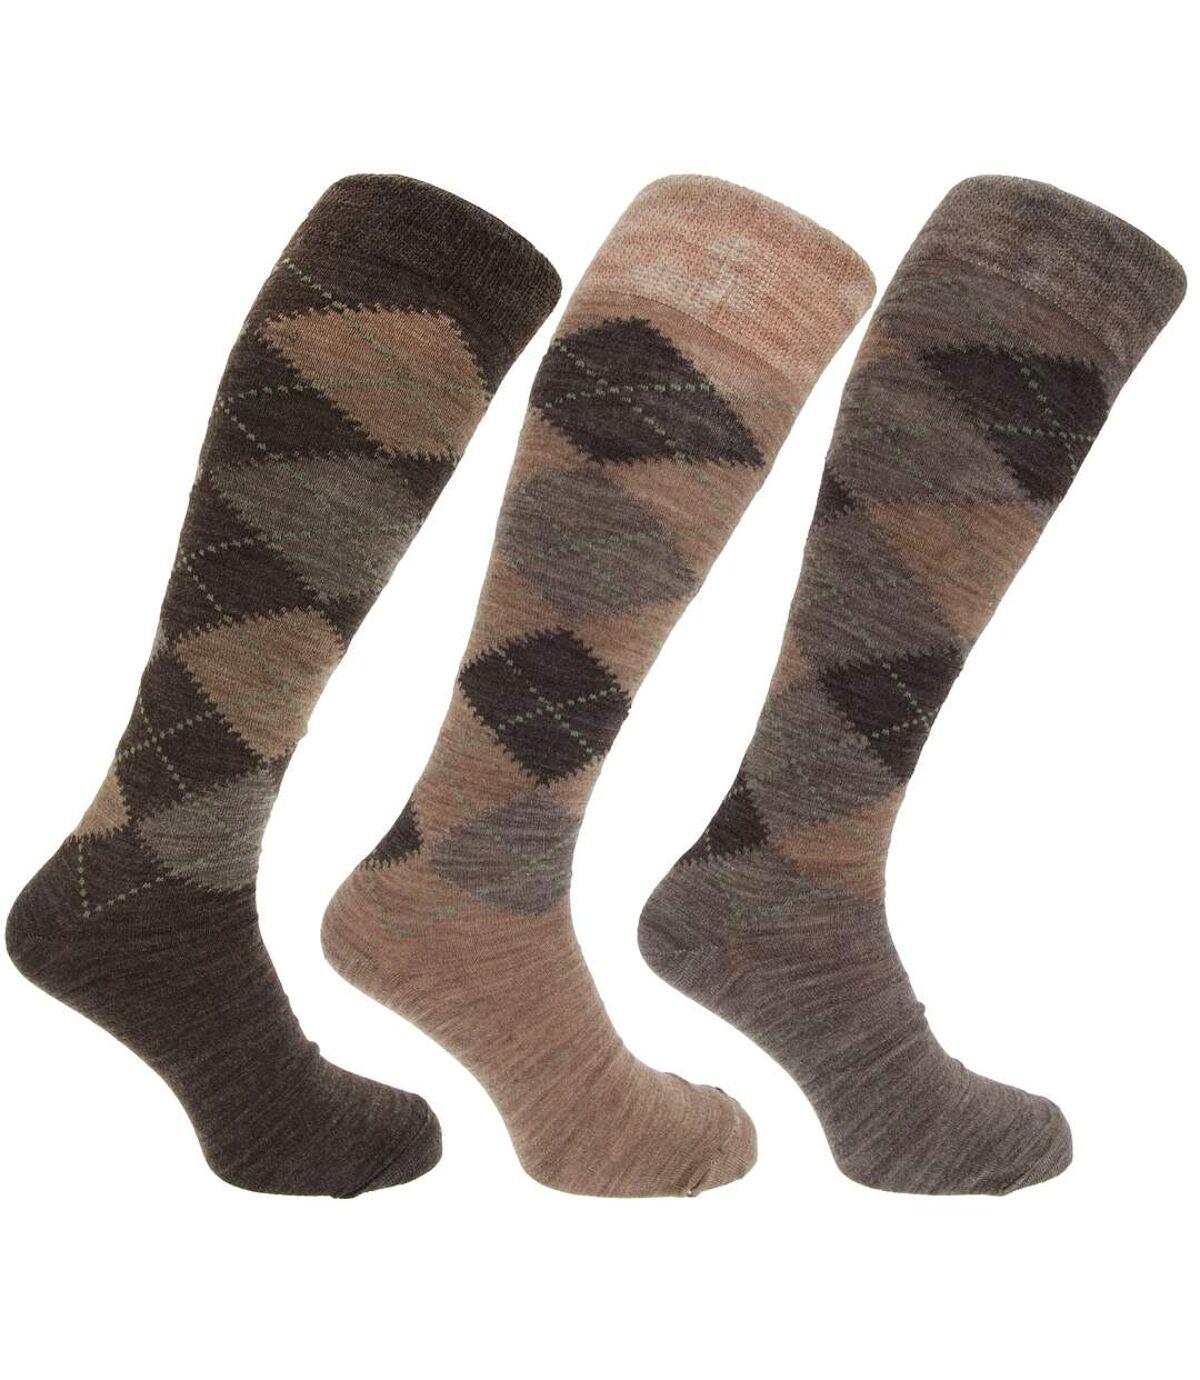 Mens Traditional Argyle Pattern Long Length Lambs Wool Blend Socks (Pack Of 3) (Shades of Brown) - UTMB277